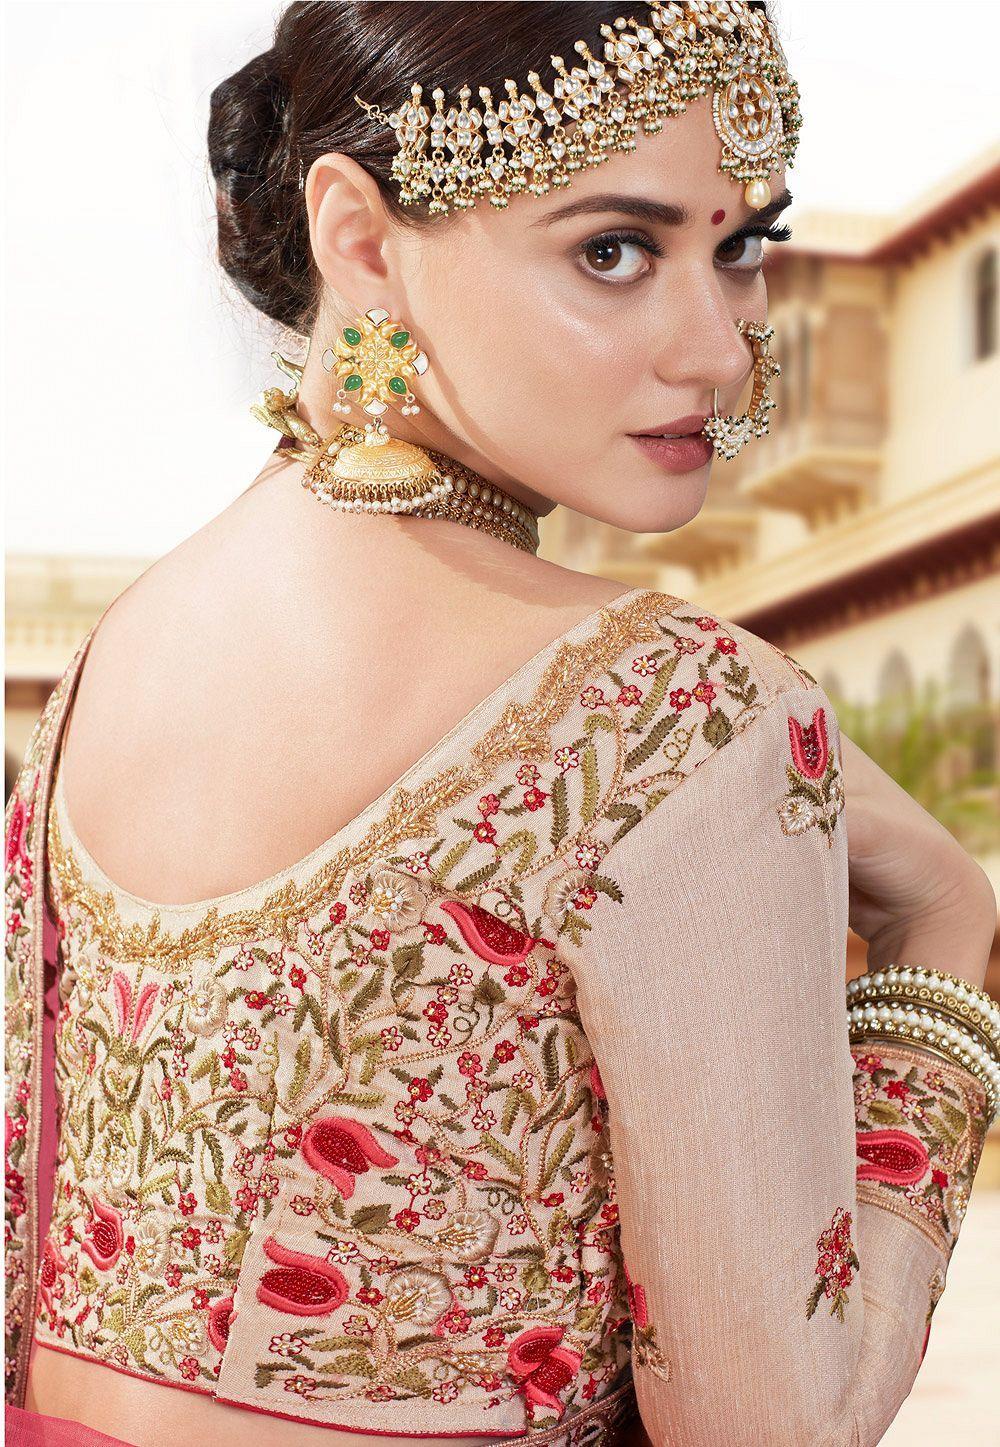 ea927cec8c Buy Cream banarasi silk Indian wedding lehenga in UK, USA and Canada ...